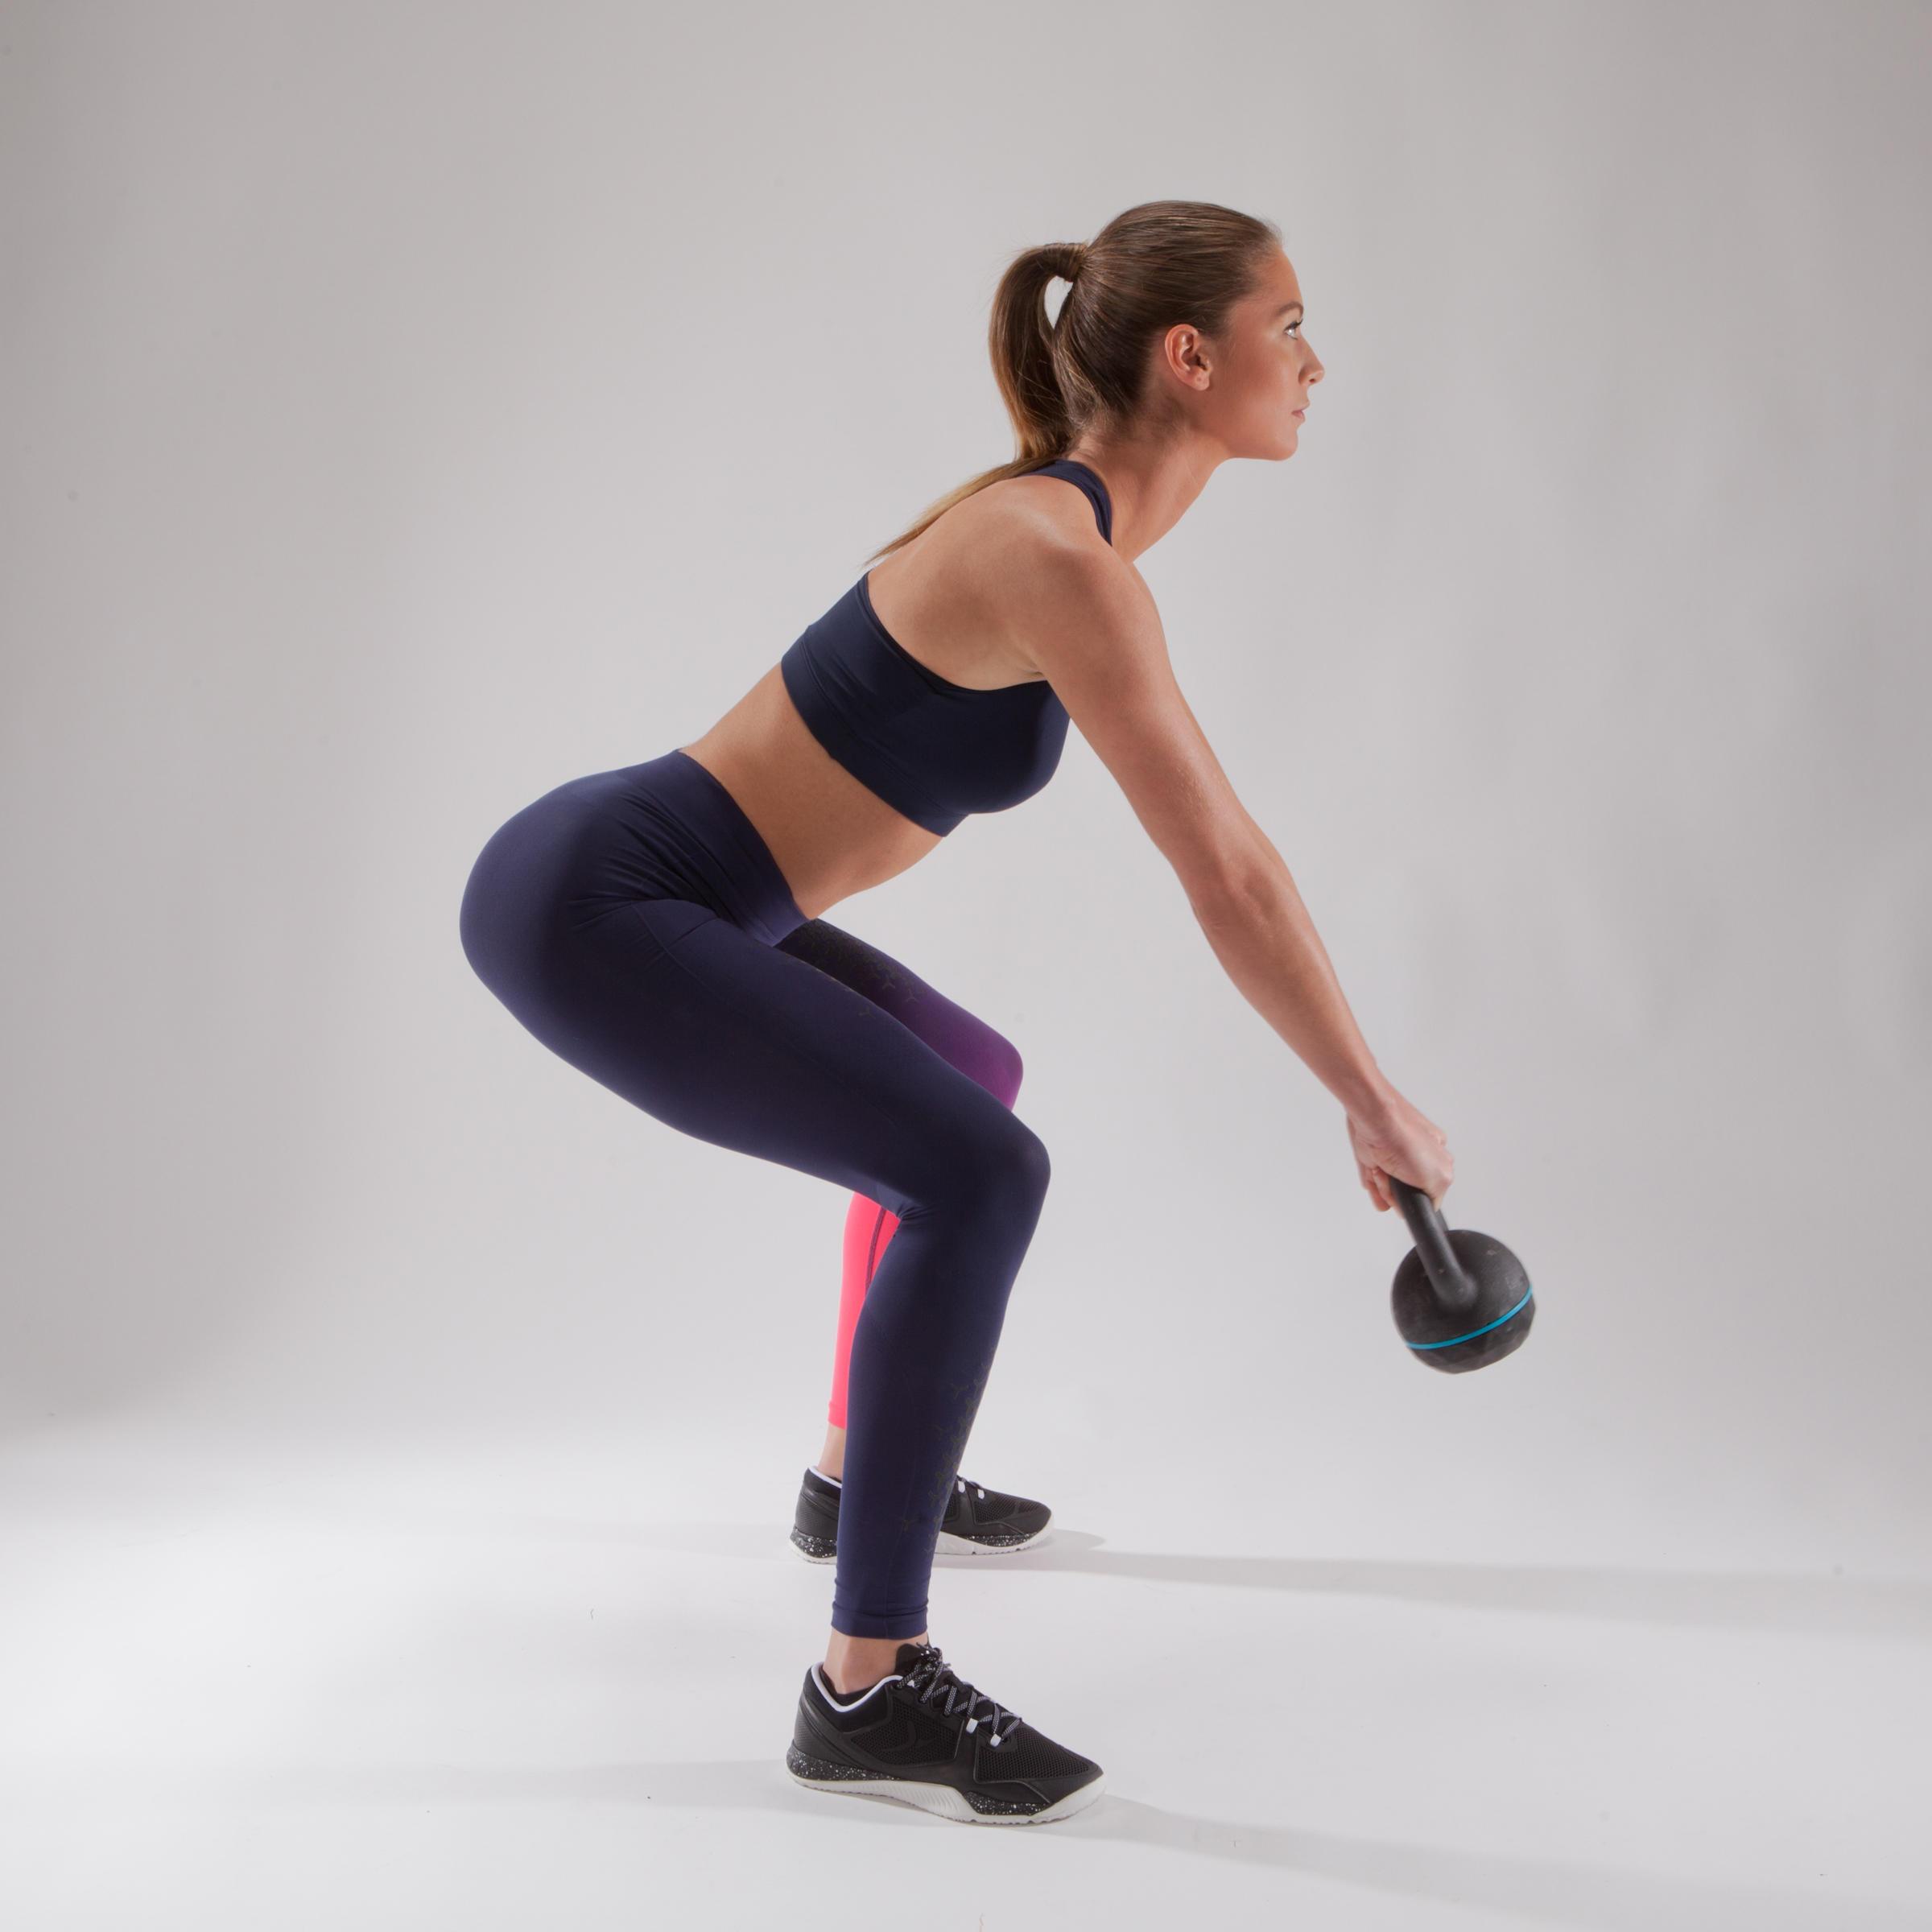 900 Women's Cross Training Leggings - Blue/Pink